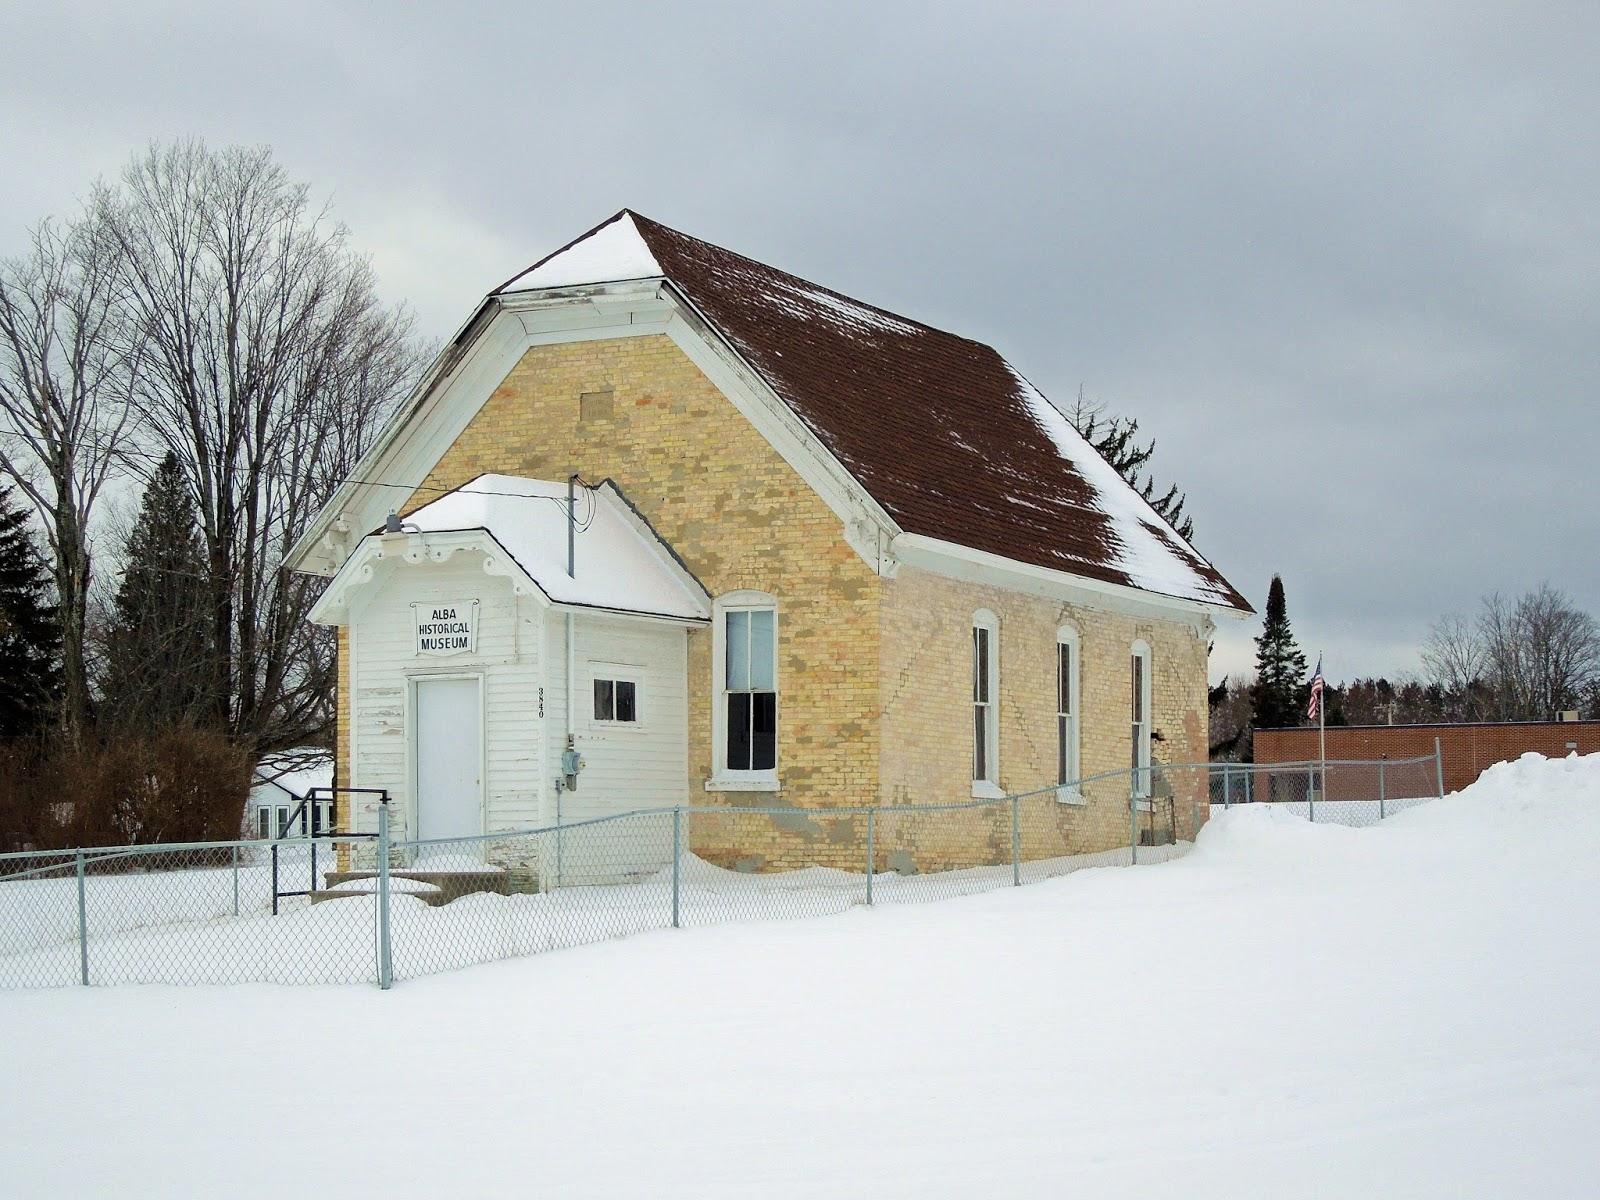 Michigan antrim county kewadin - Location 3366 Jordan River Road Alba In Chestonia Township